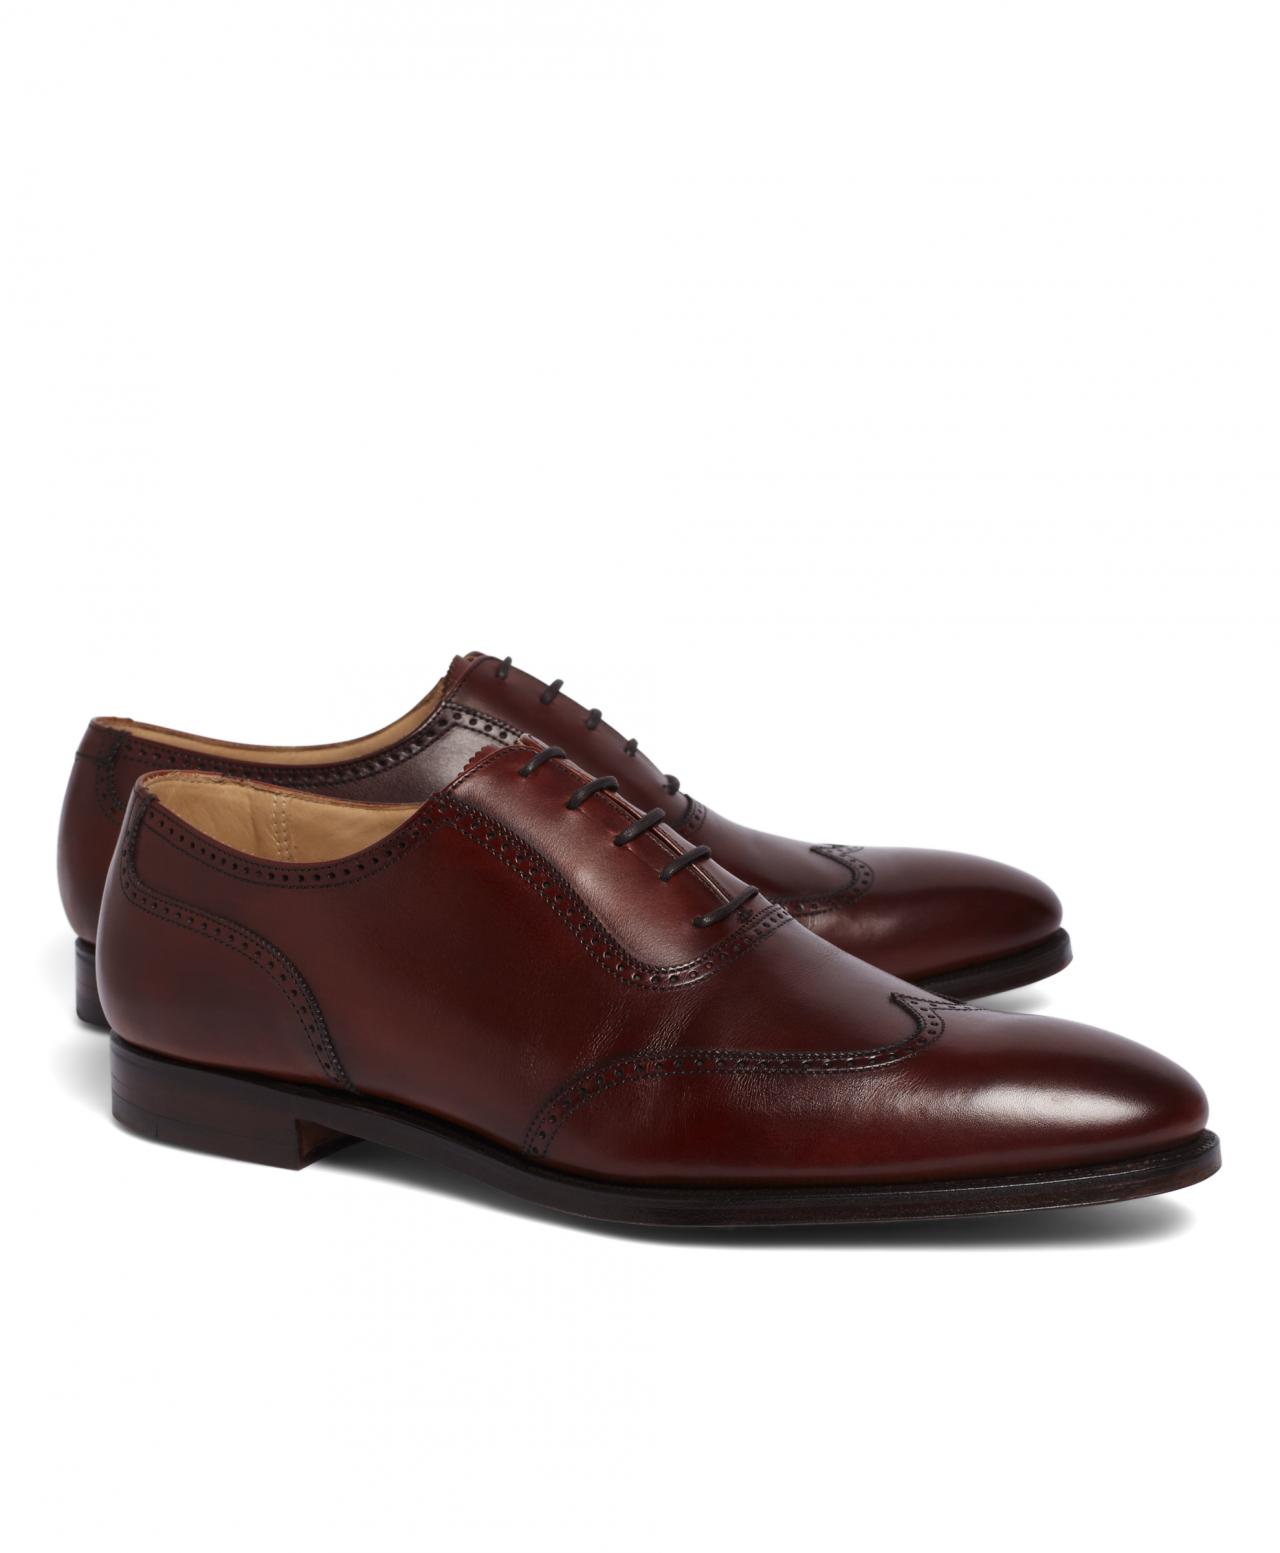 Cinco Estas Elegir Claves Zapatos De Mira Para HombreLifestyle 4Rj5AL